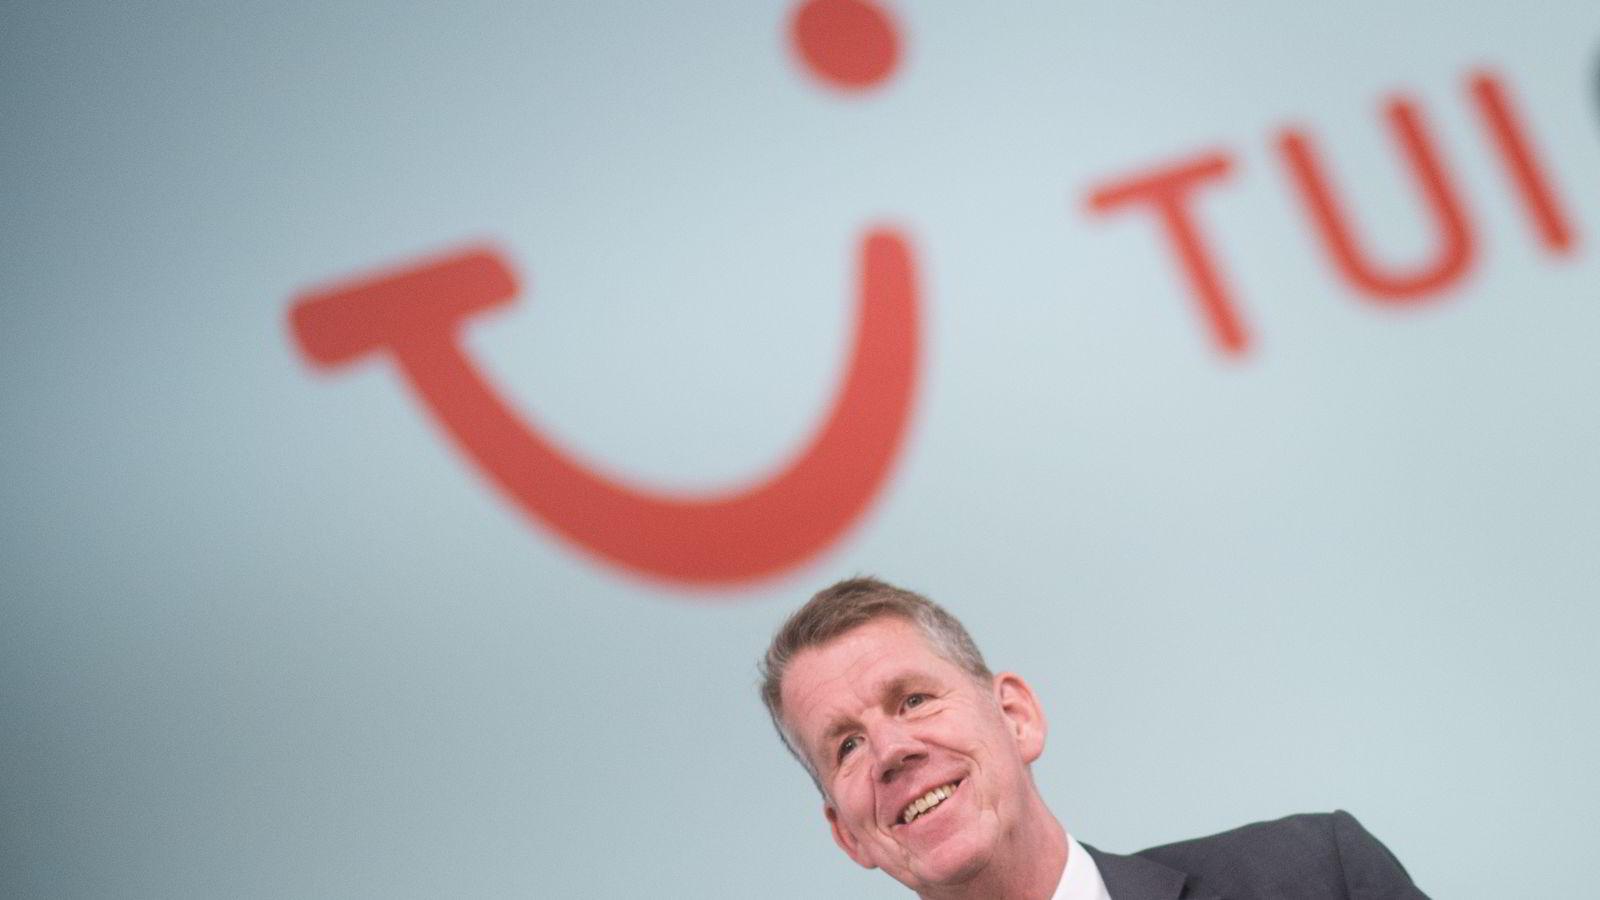 Tui-sjef Friedrich Joussen, her fra reiselivskonsernets generalforsamling i februar, 2016. Foto: Afg/Julian Stratenschulte